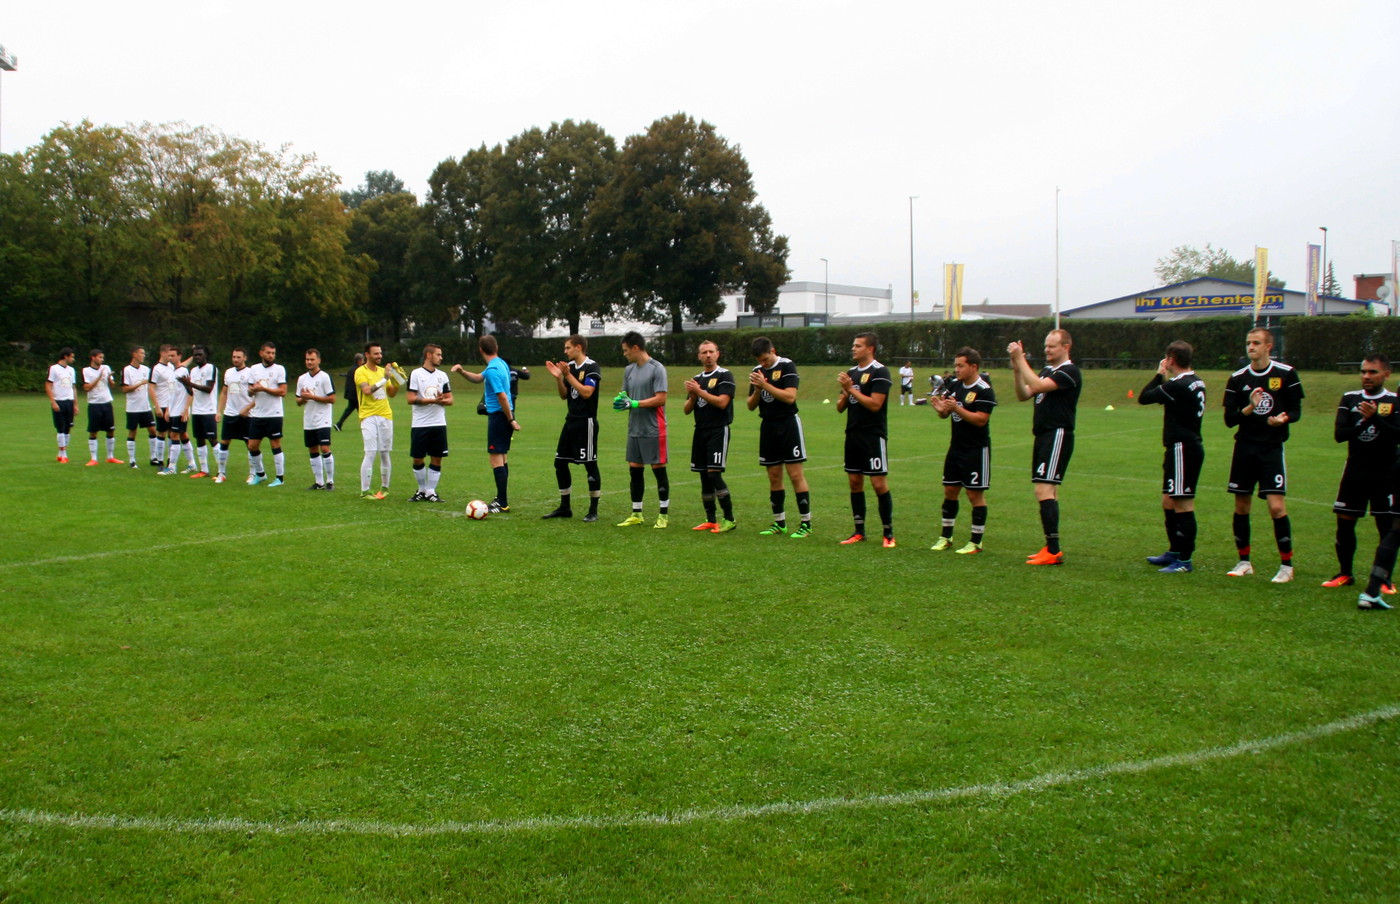 TG Kirchheim - TSV Owen